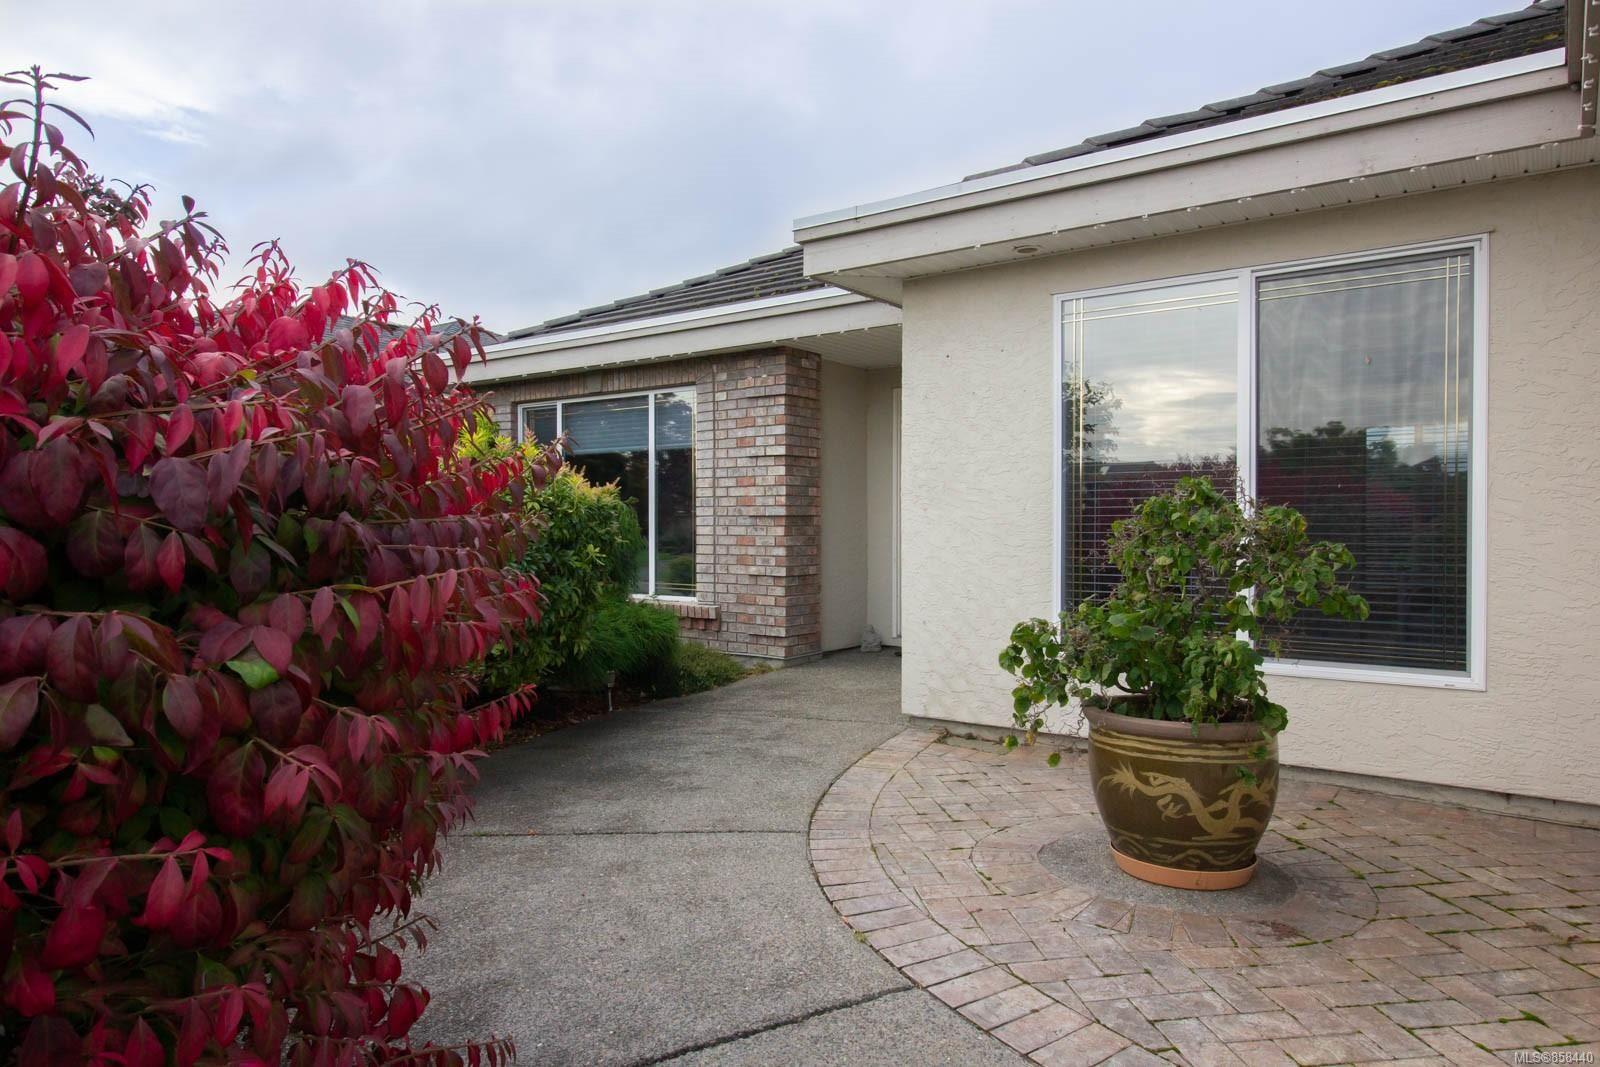 Photo 11: Photos: 798 Devon Pl in : PQ Qualicum Beach House for sale (Parksville/Qualicum)  : MLS®# 858440